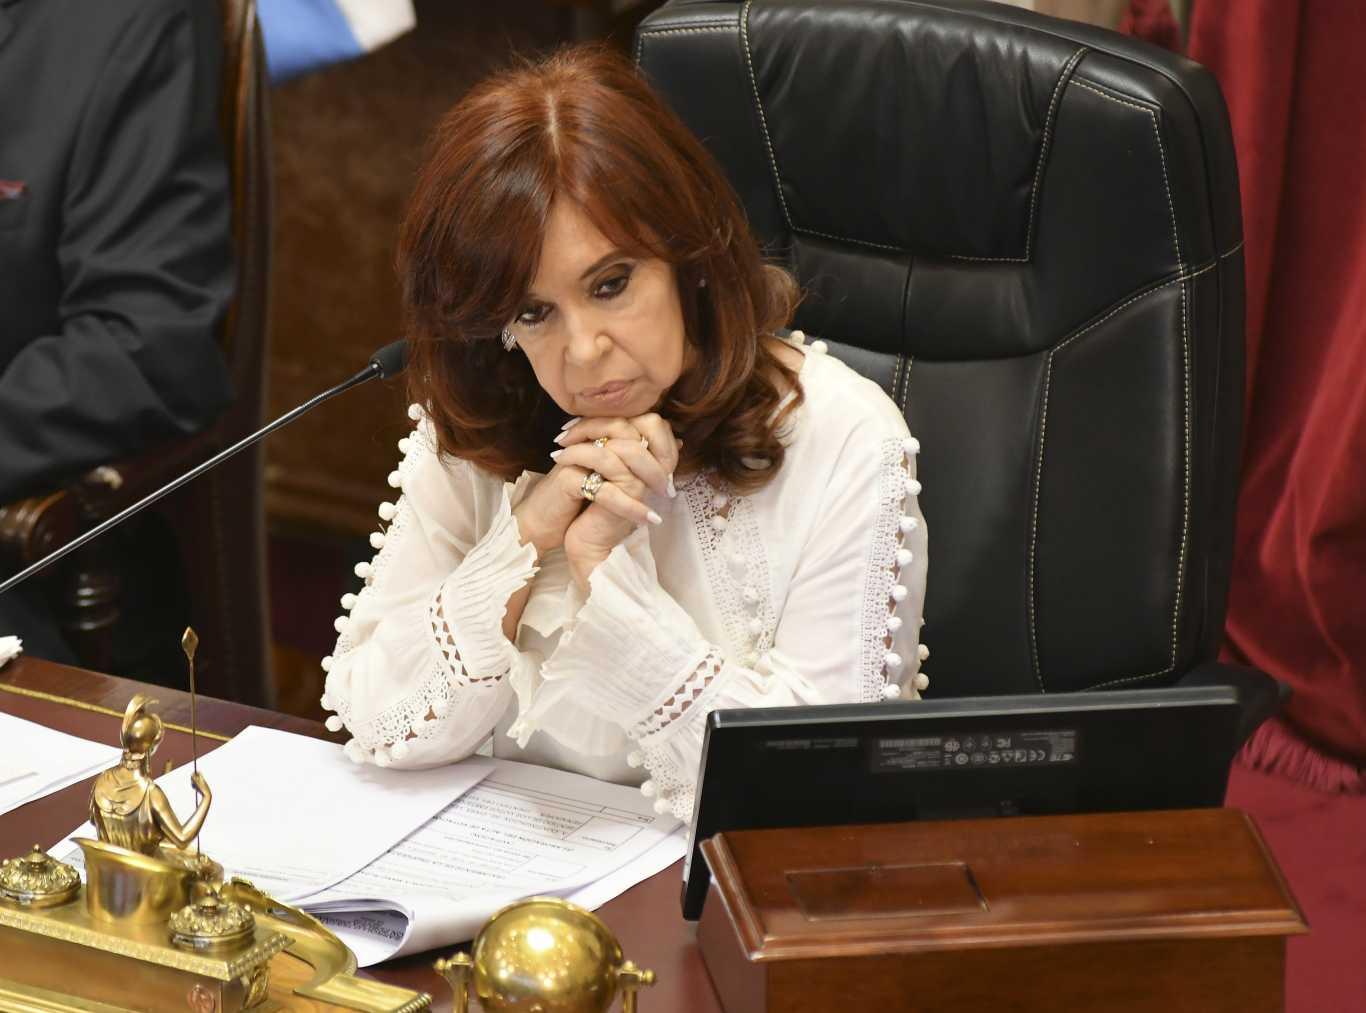 Cristina-Fernandez-de-Kirchner-1402-c